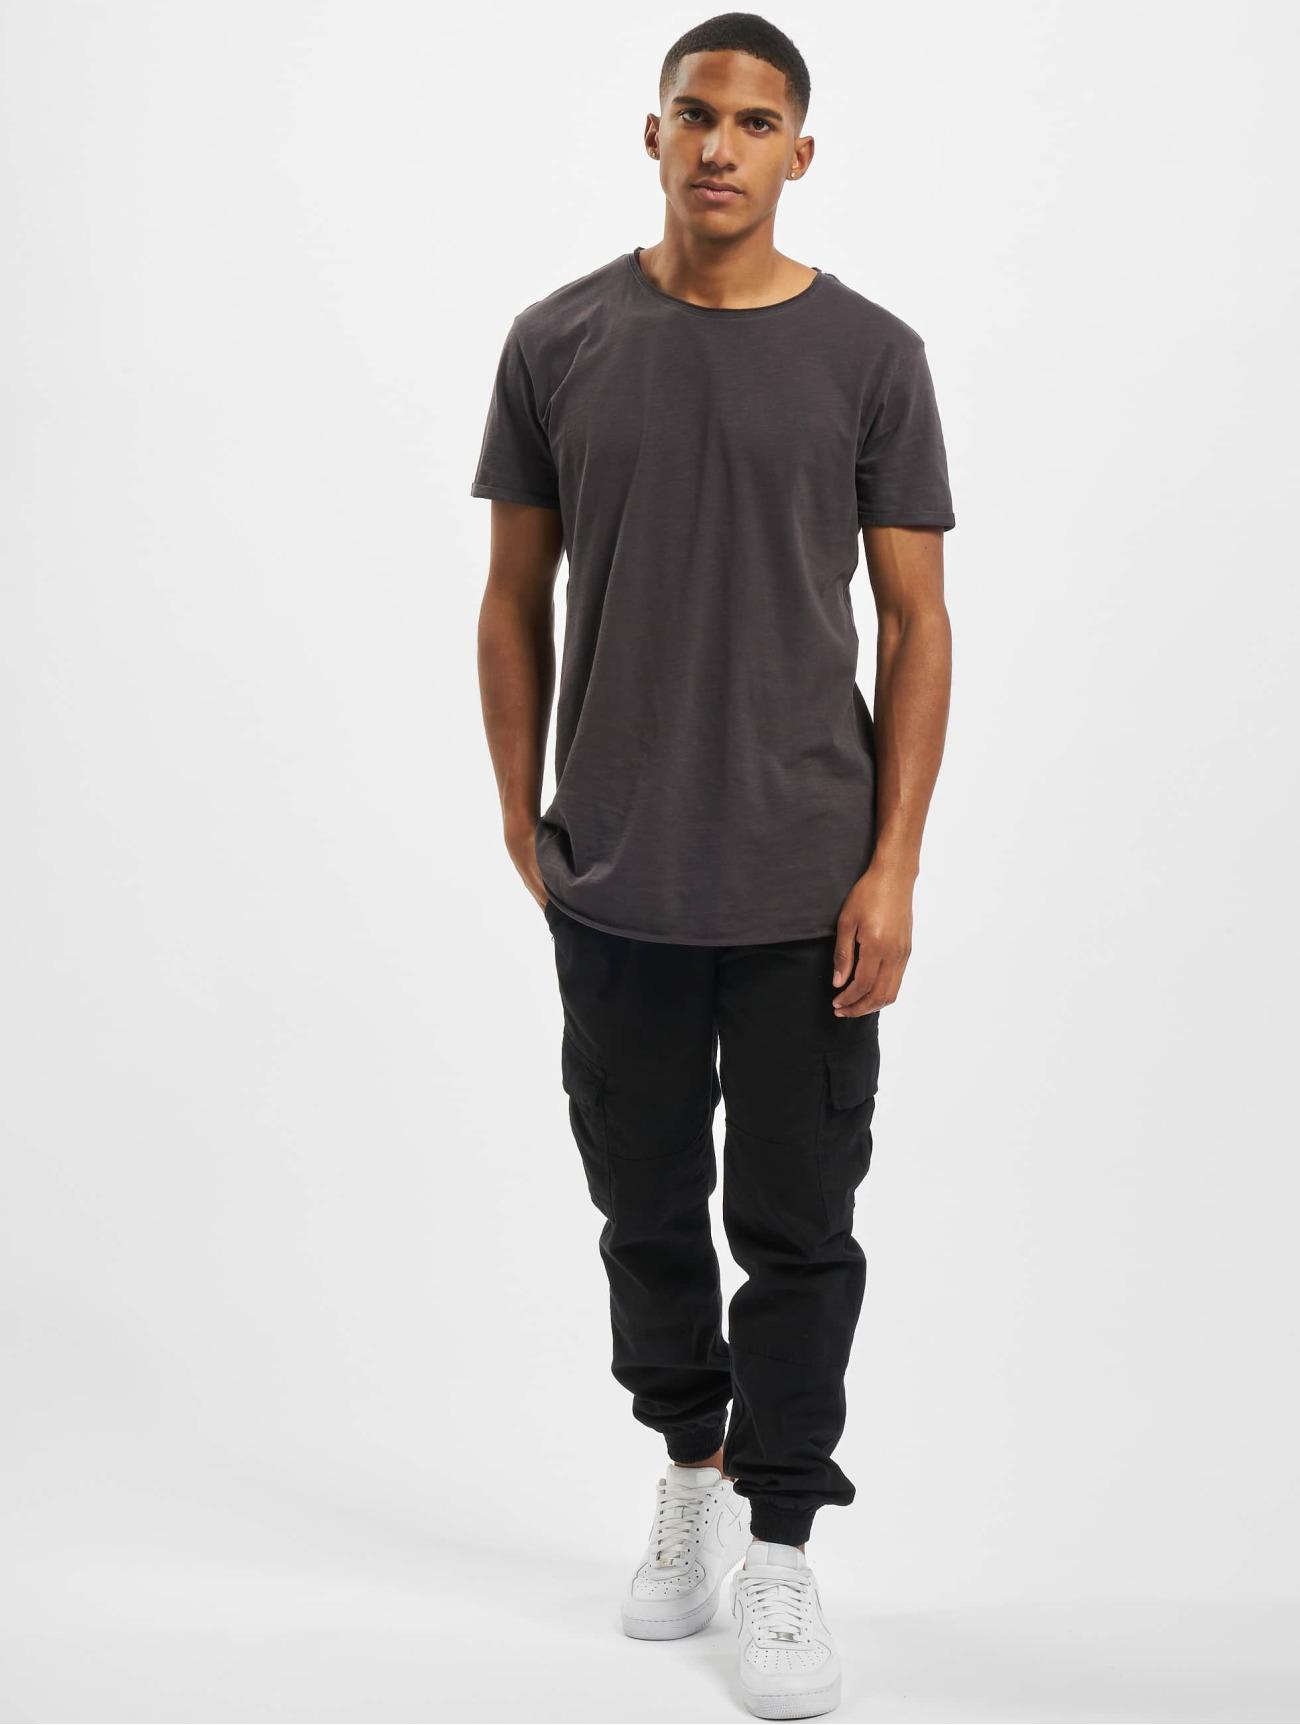 Sky Rebel | Basic 3-Pack  gris Homme T-Shirt  775806| Homme Hauts